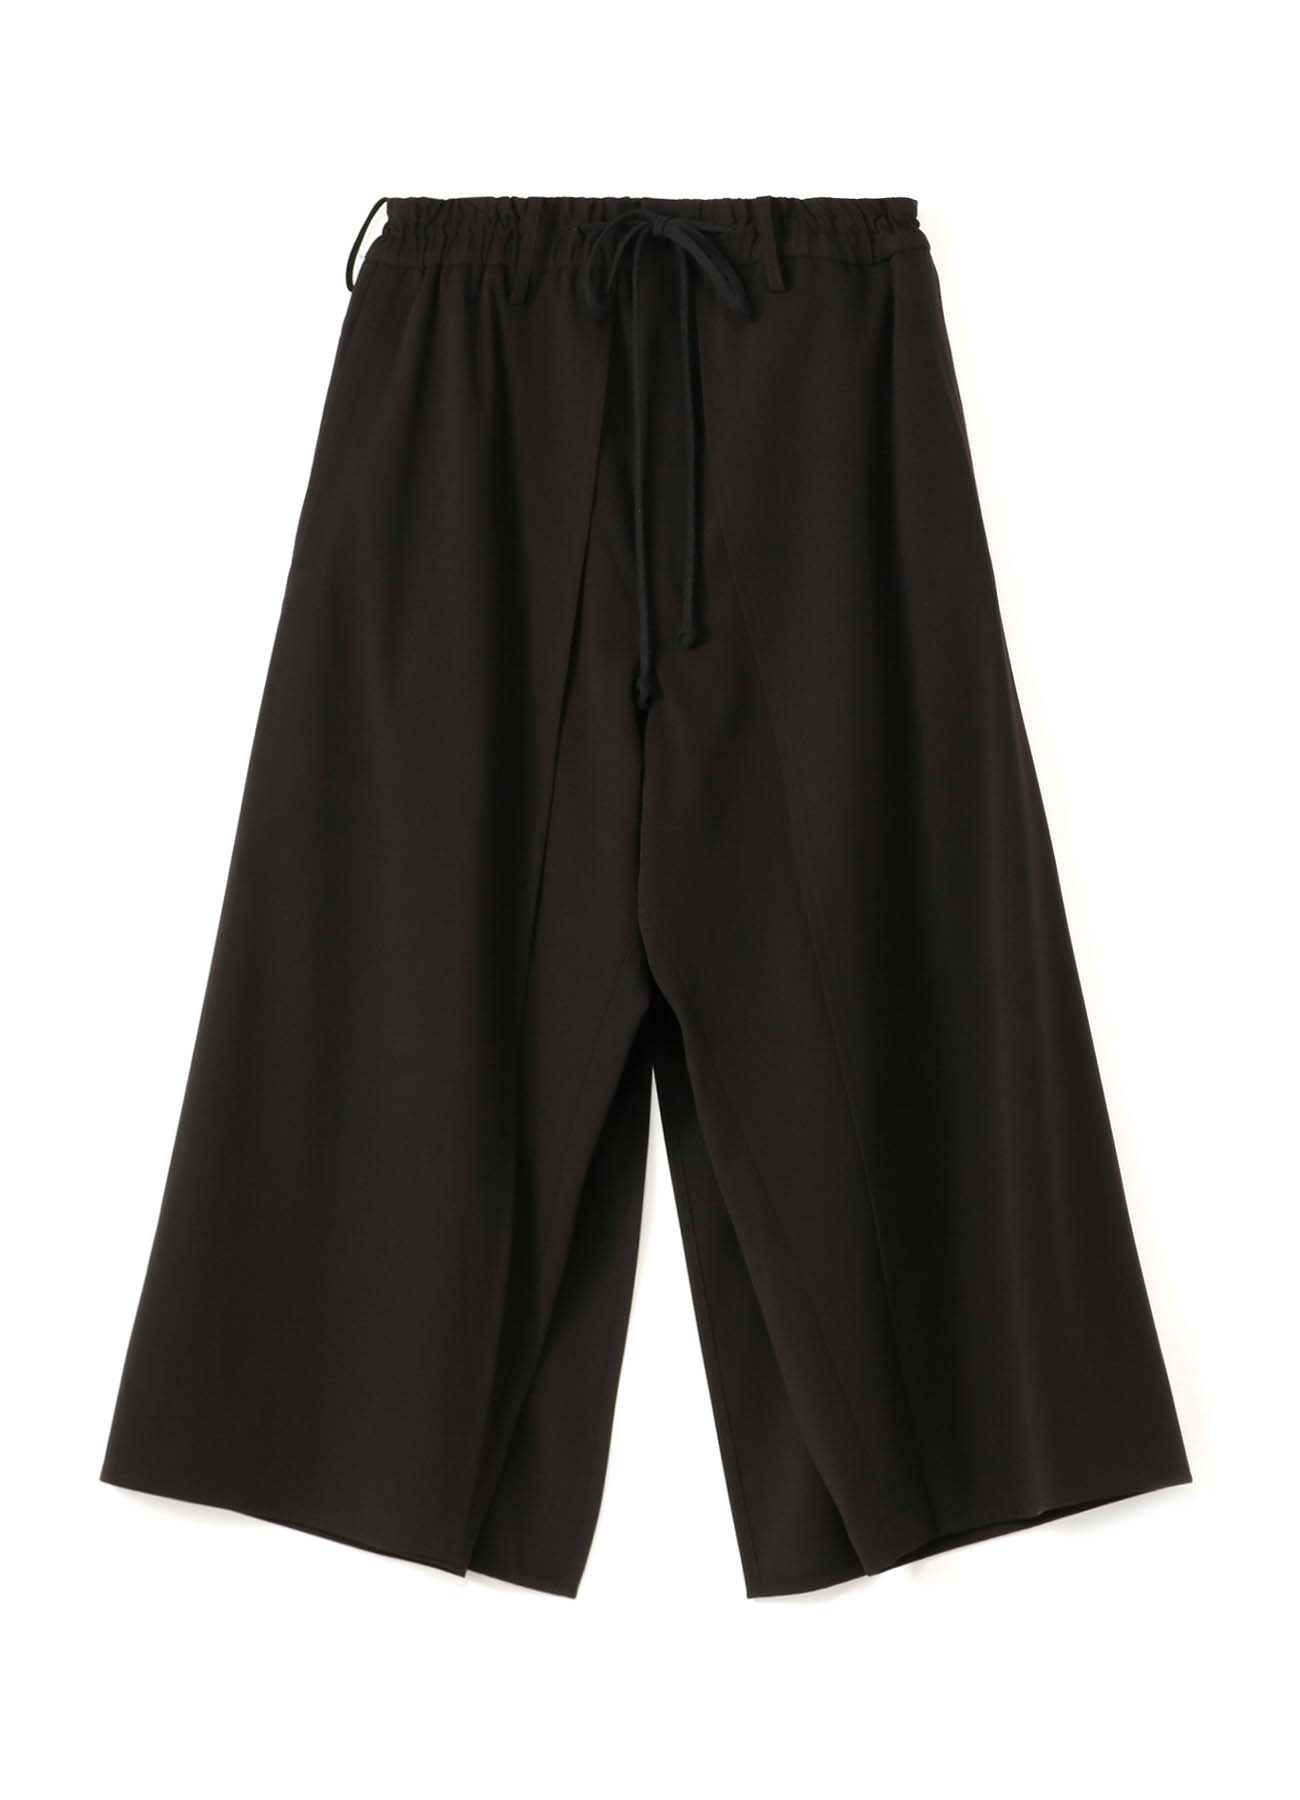 Pe/Rayon Gabardine Stretch Layer Cover Pants